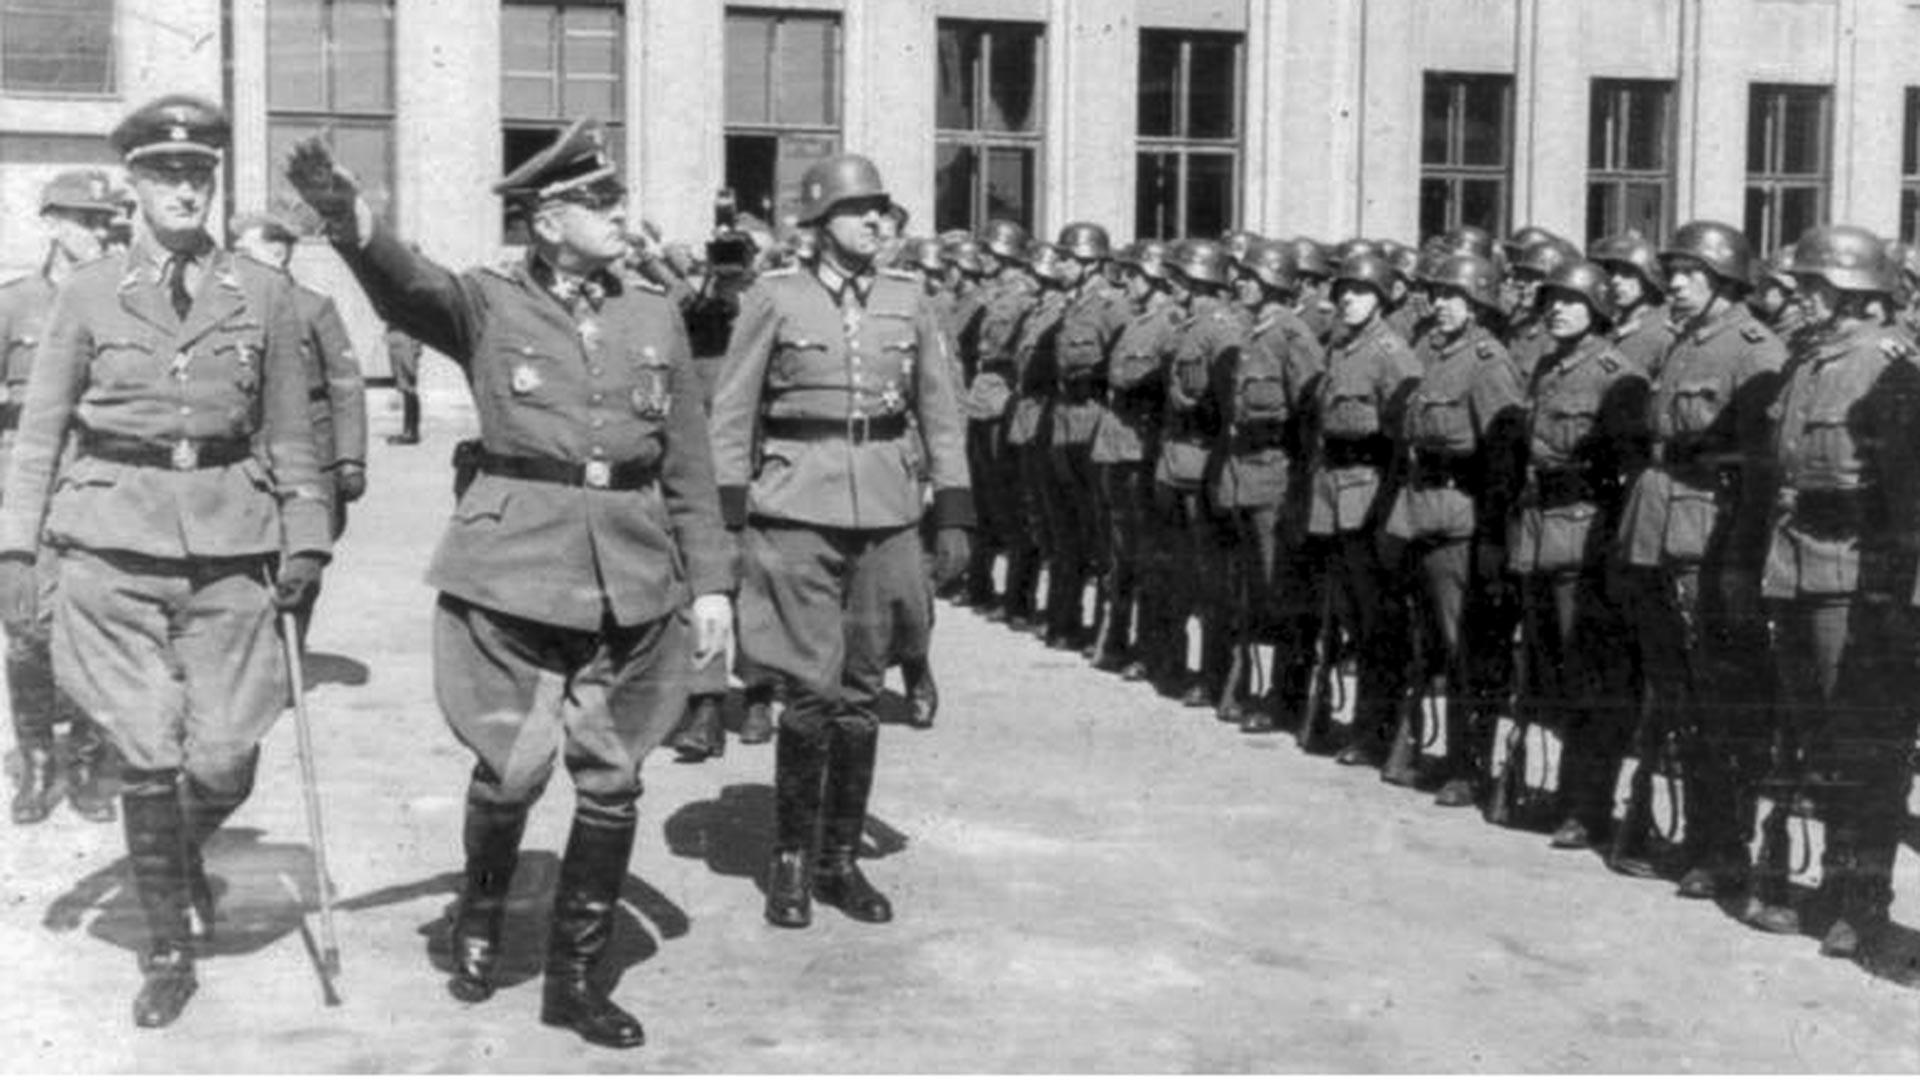 СССР, Минск. Парада на Орднунгполицај (униформирани германски цивилни полиции) на Плоштадот Ленин (претходно Плоштад на независноста).